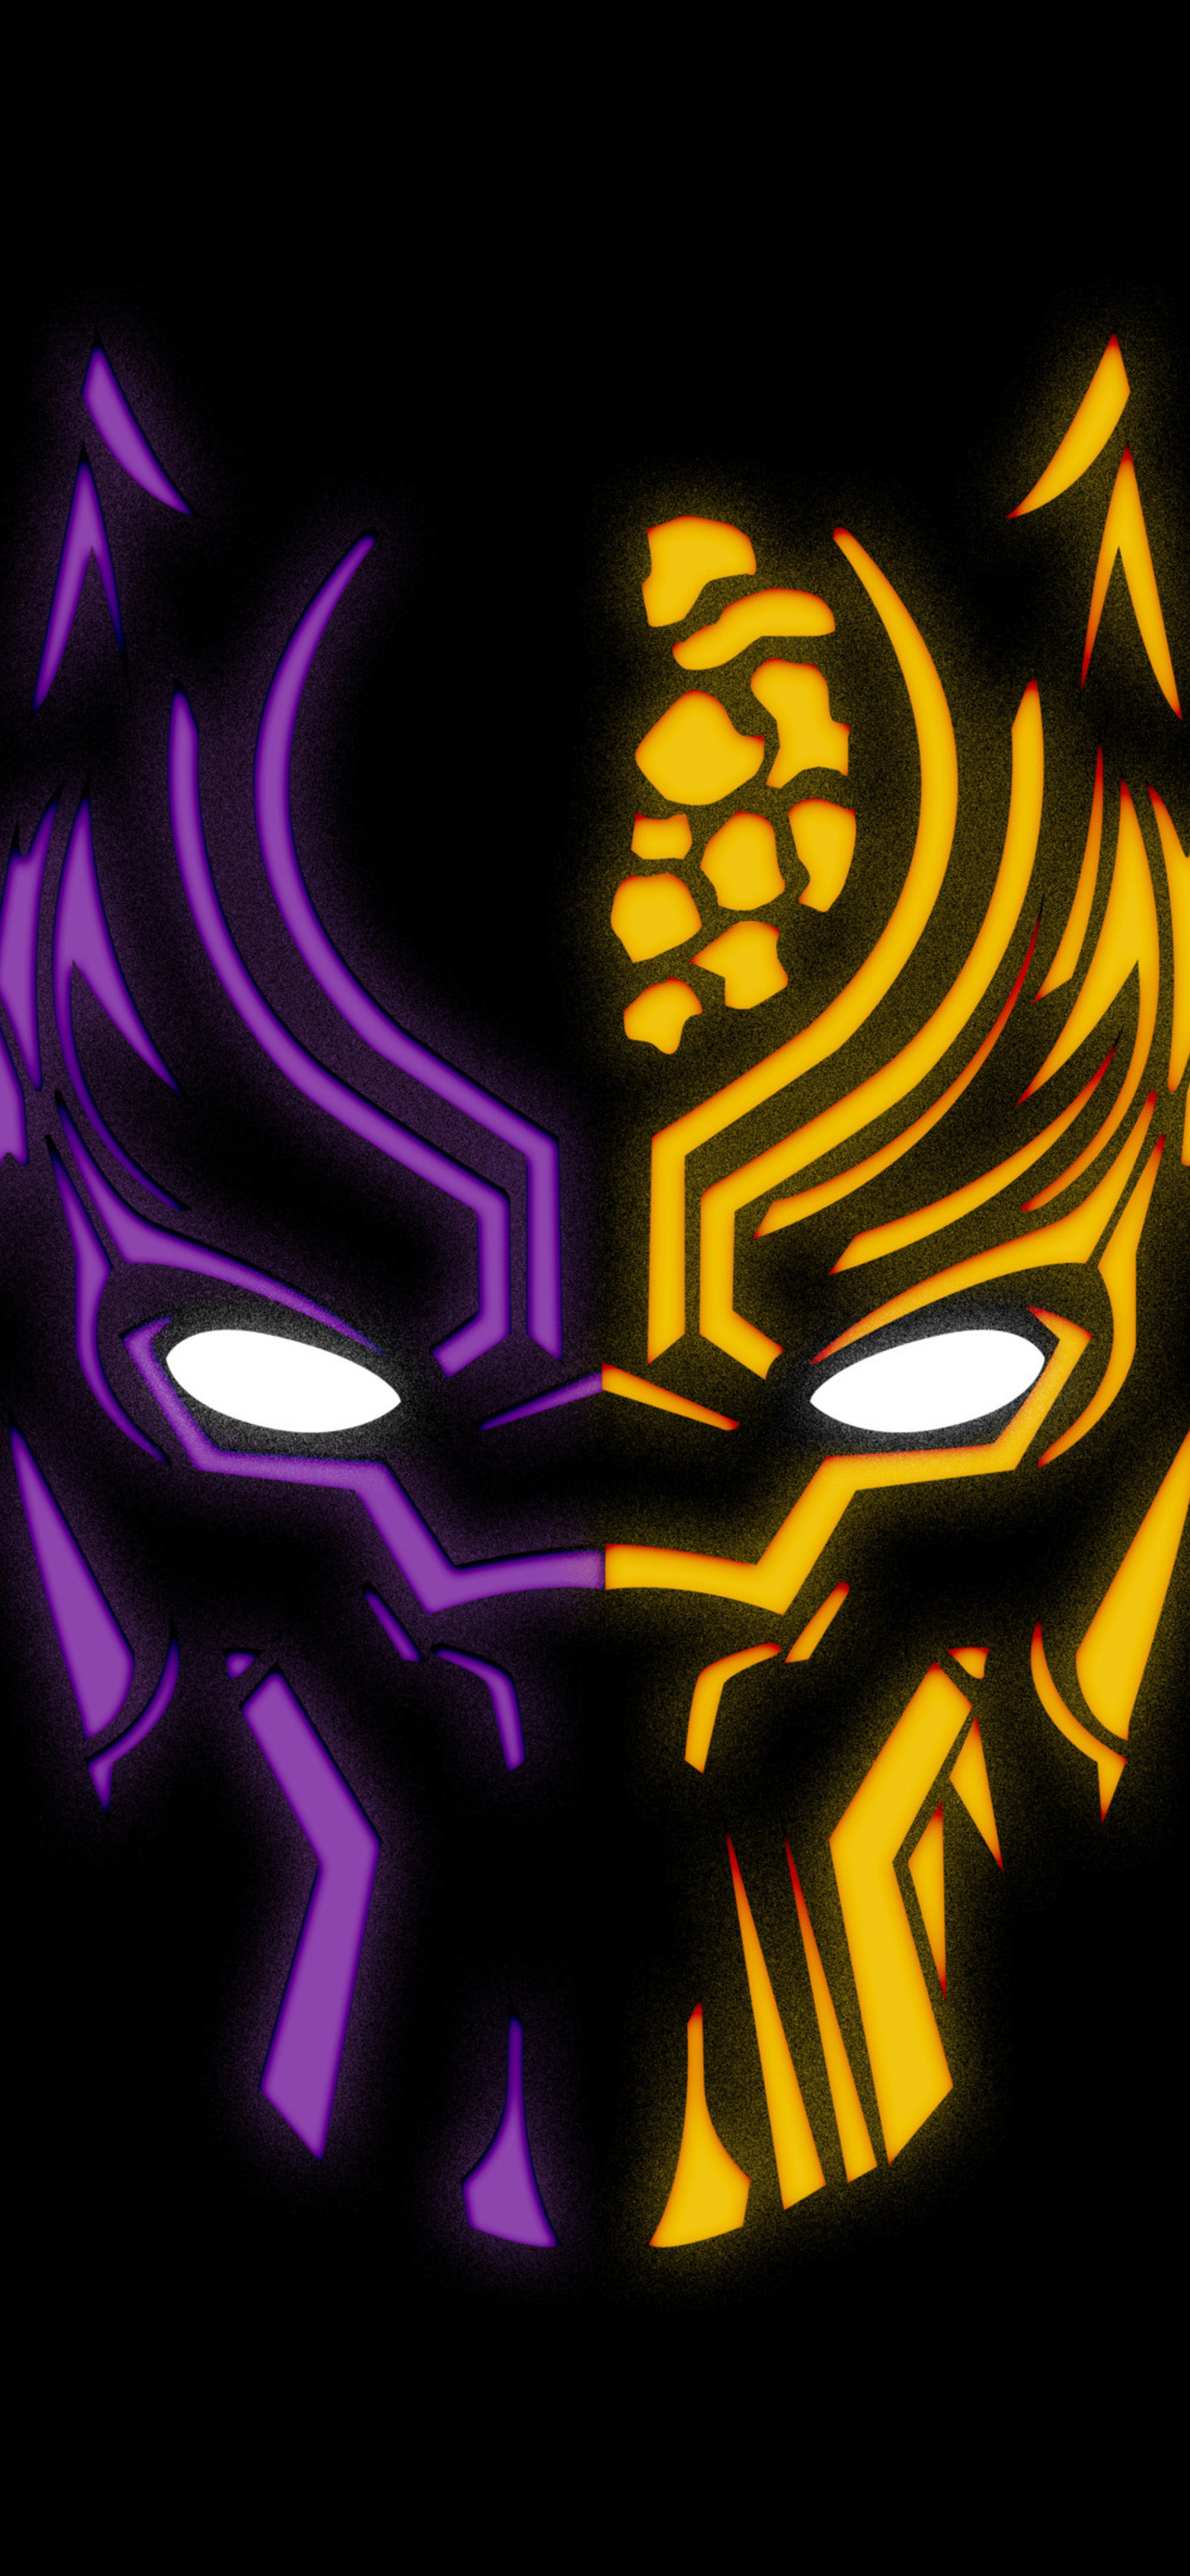 1242x2688 Black Panther Illustration 4k Iphone Xs Max Hd 4k